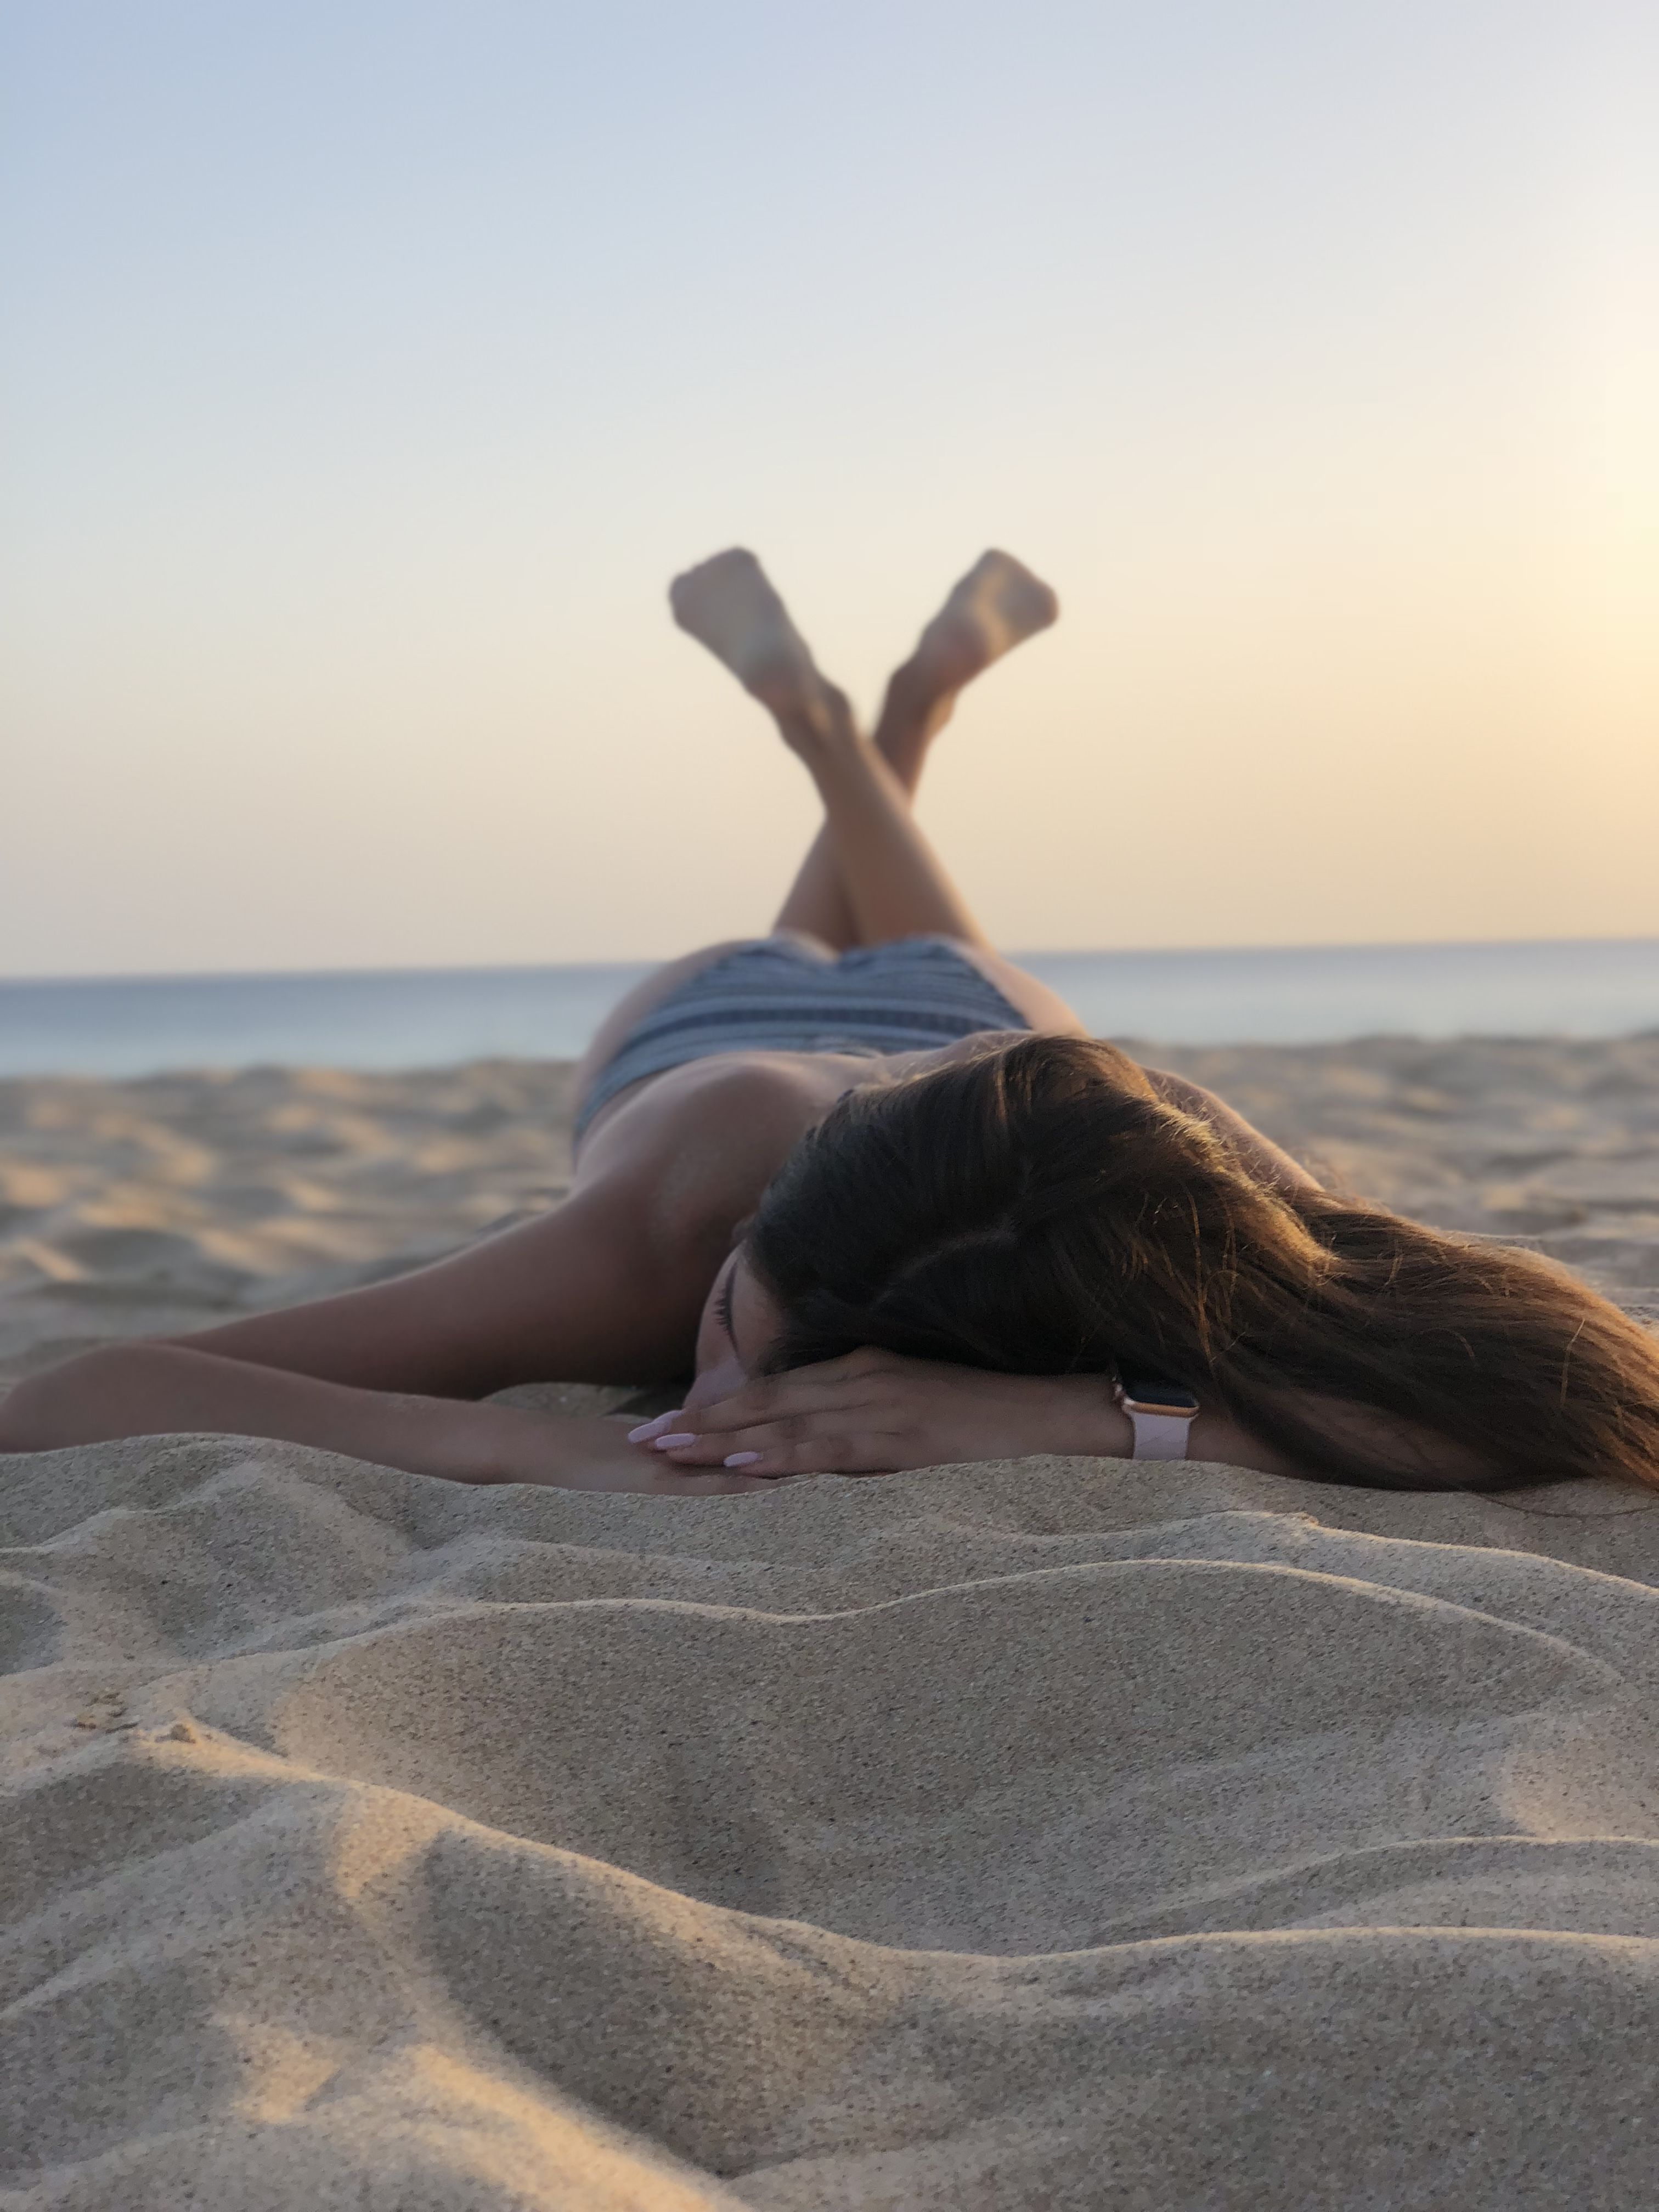 ⛱🏝☀️ #beach #sea #tumblr #Beachgirlphotography #Beachgirltumblr